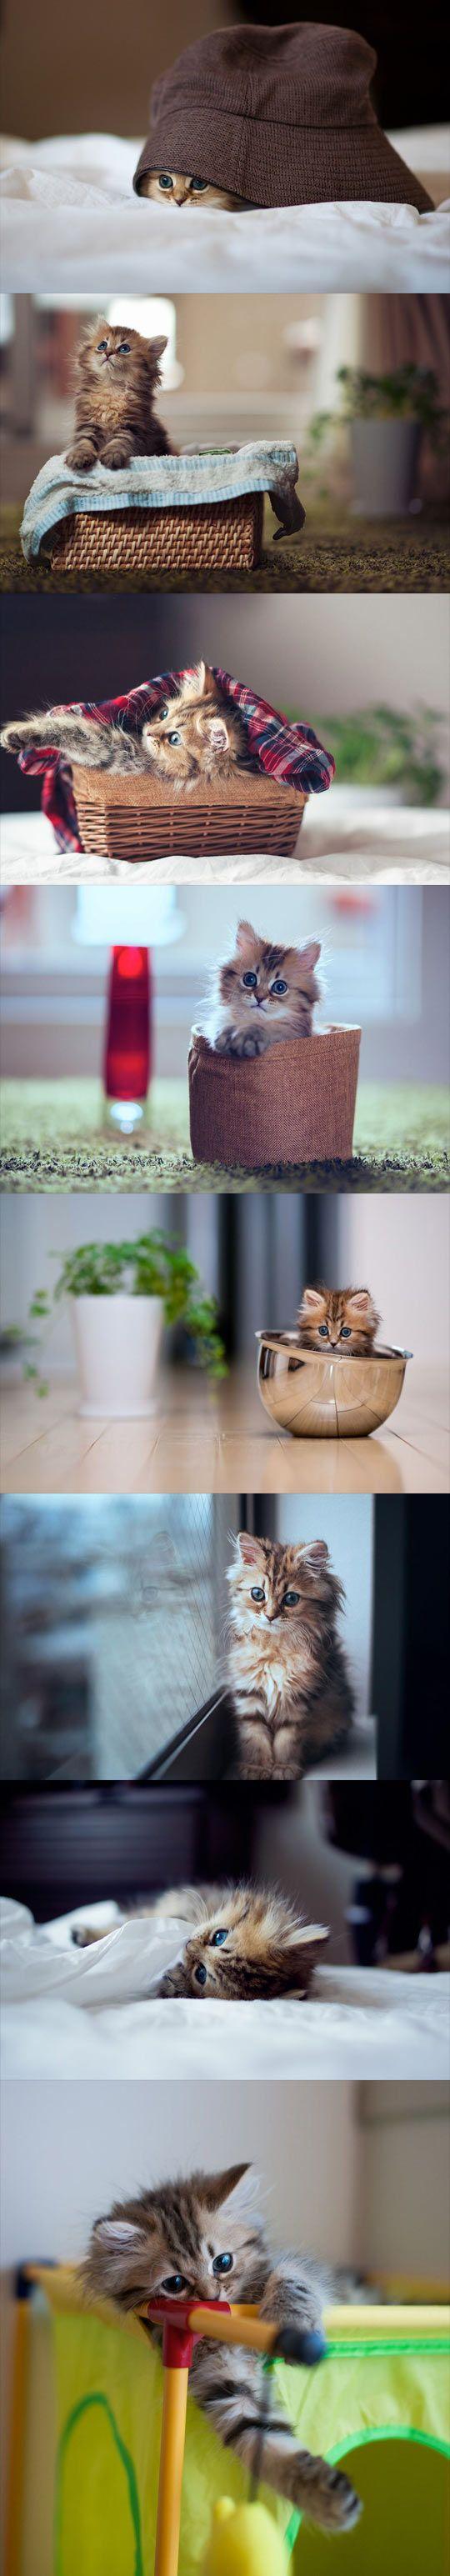 cute-cat-kitten-little-pictures-photos-bowl